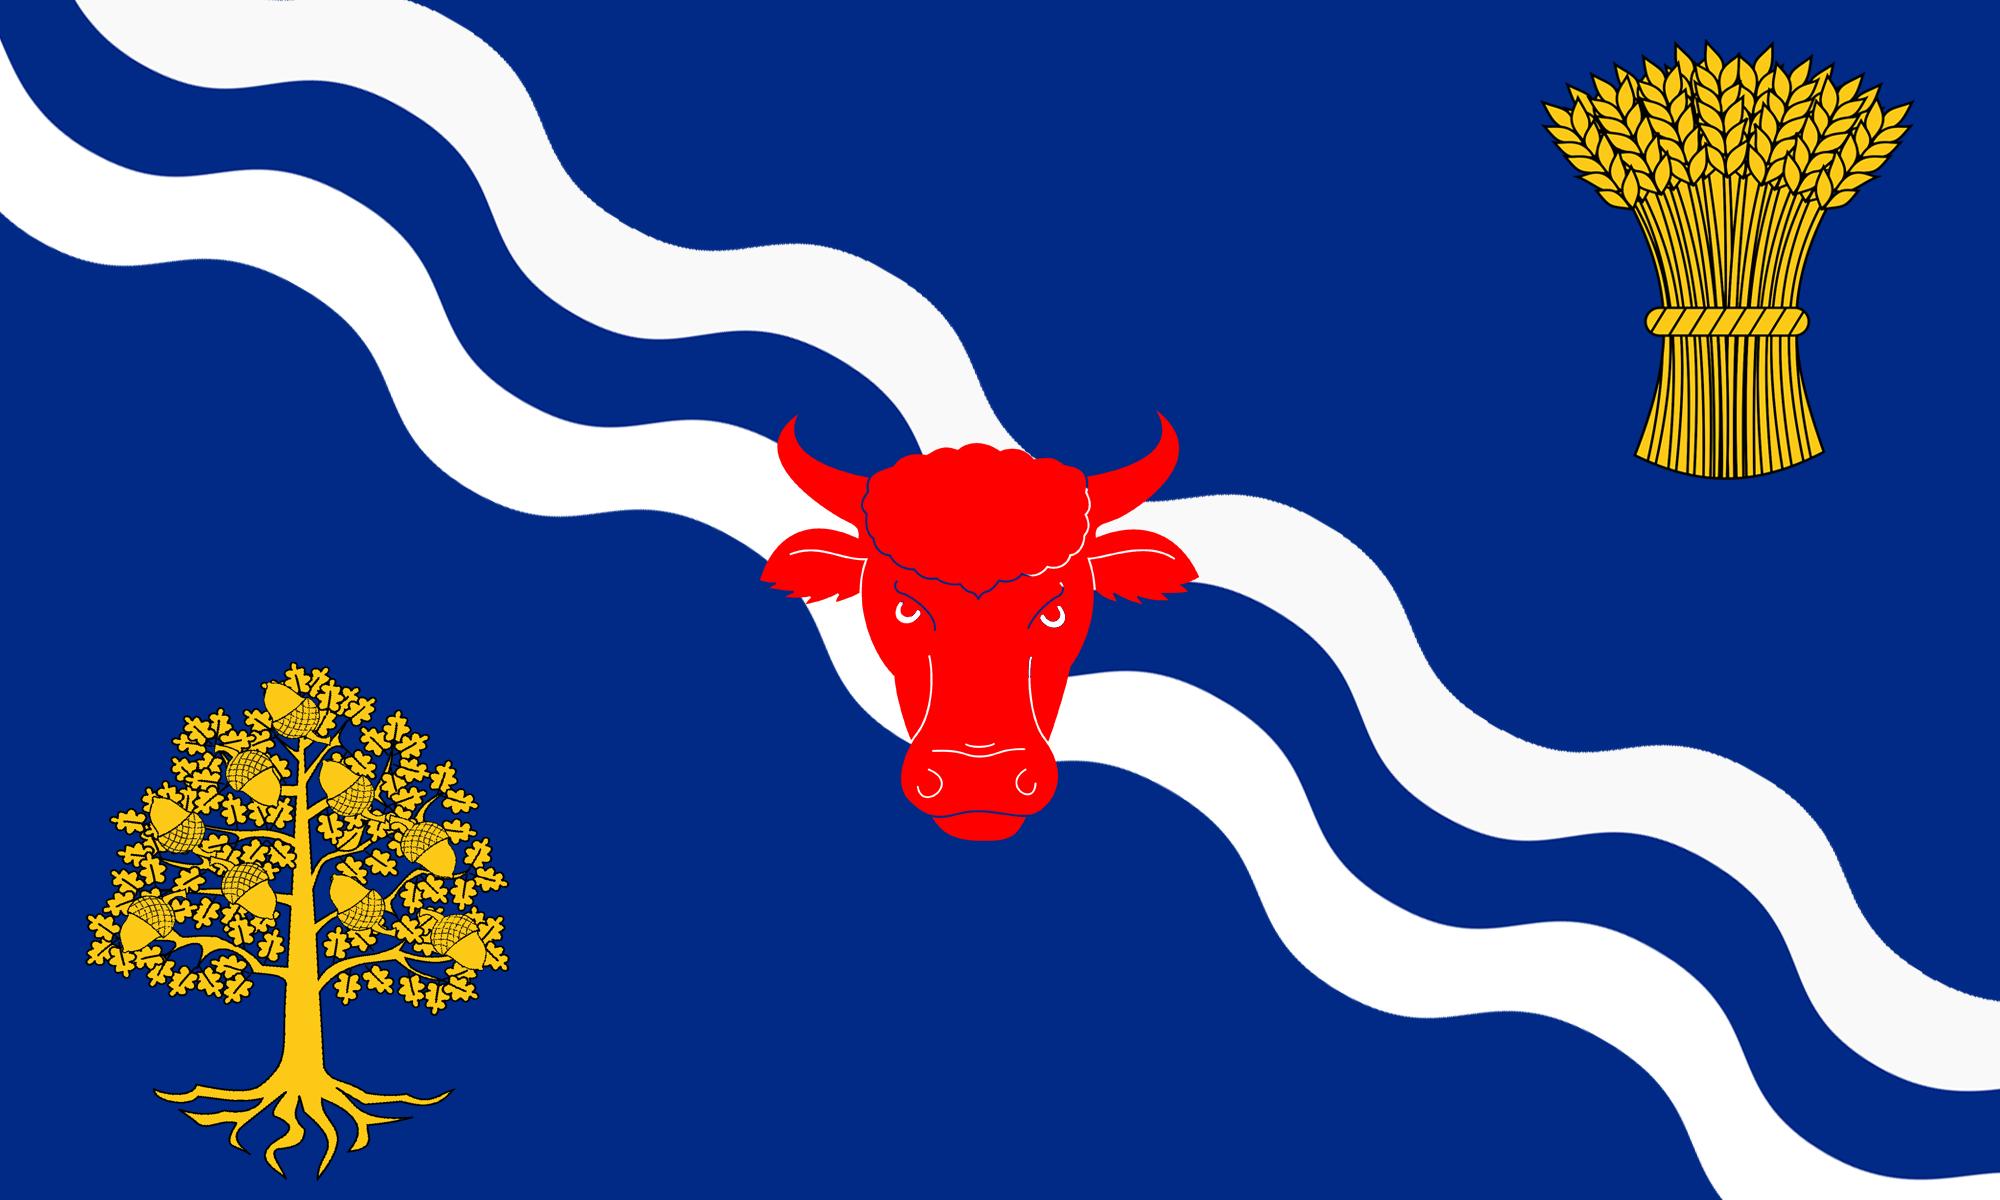 Oxfordshire Flag 5 x 3Ft